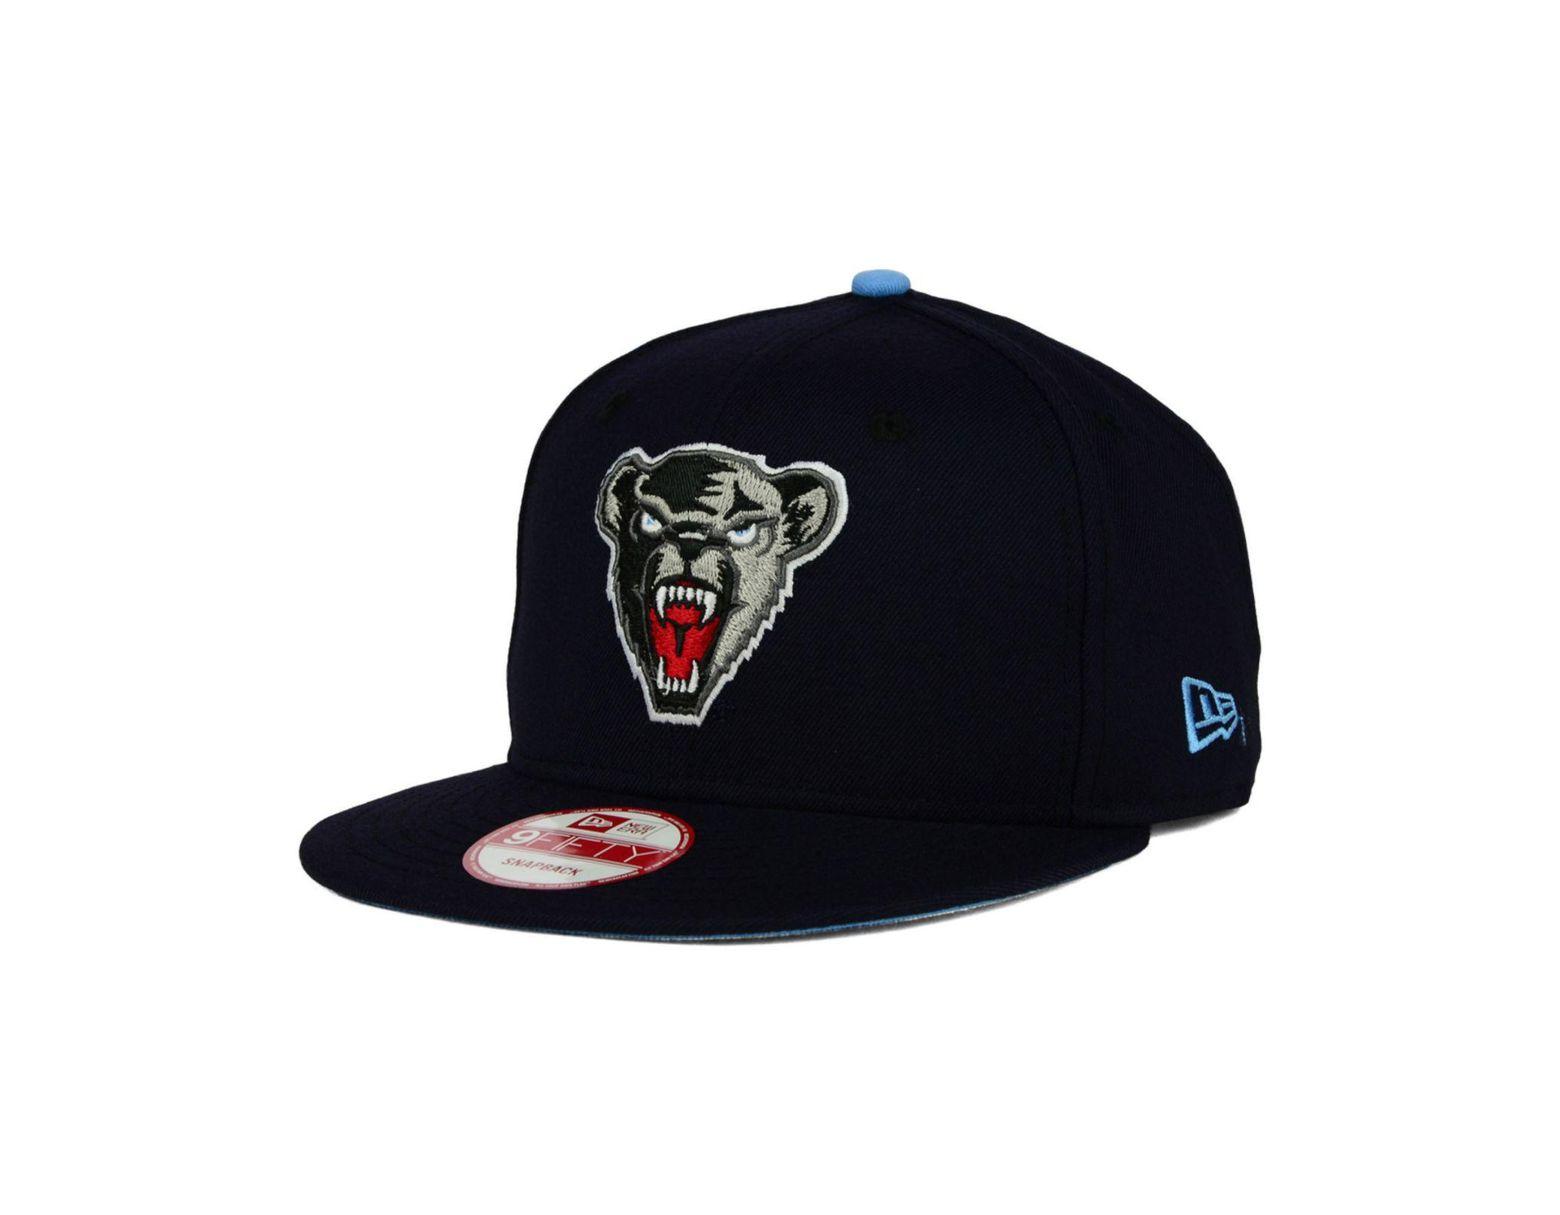 732f7336 Men's Blue Maine Black Bears Core 9fifty Snapback Cap